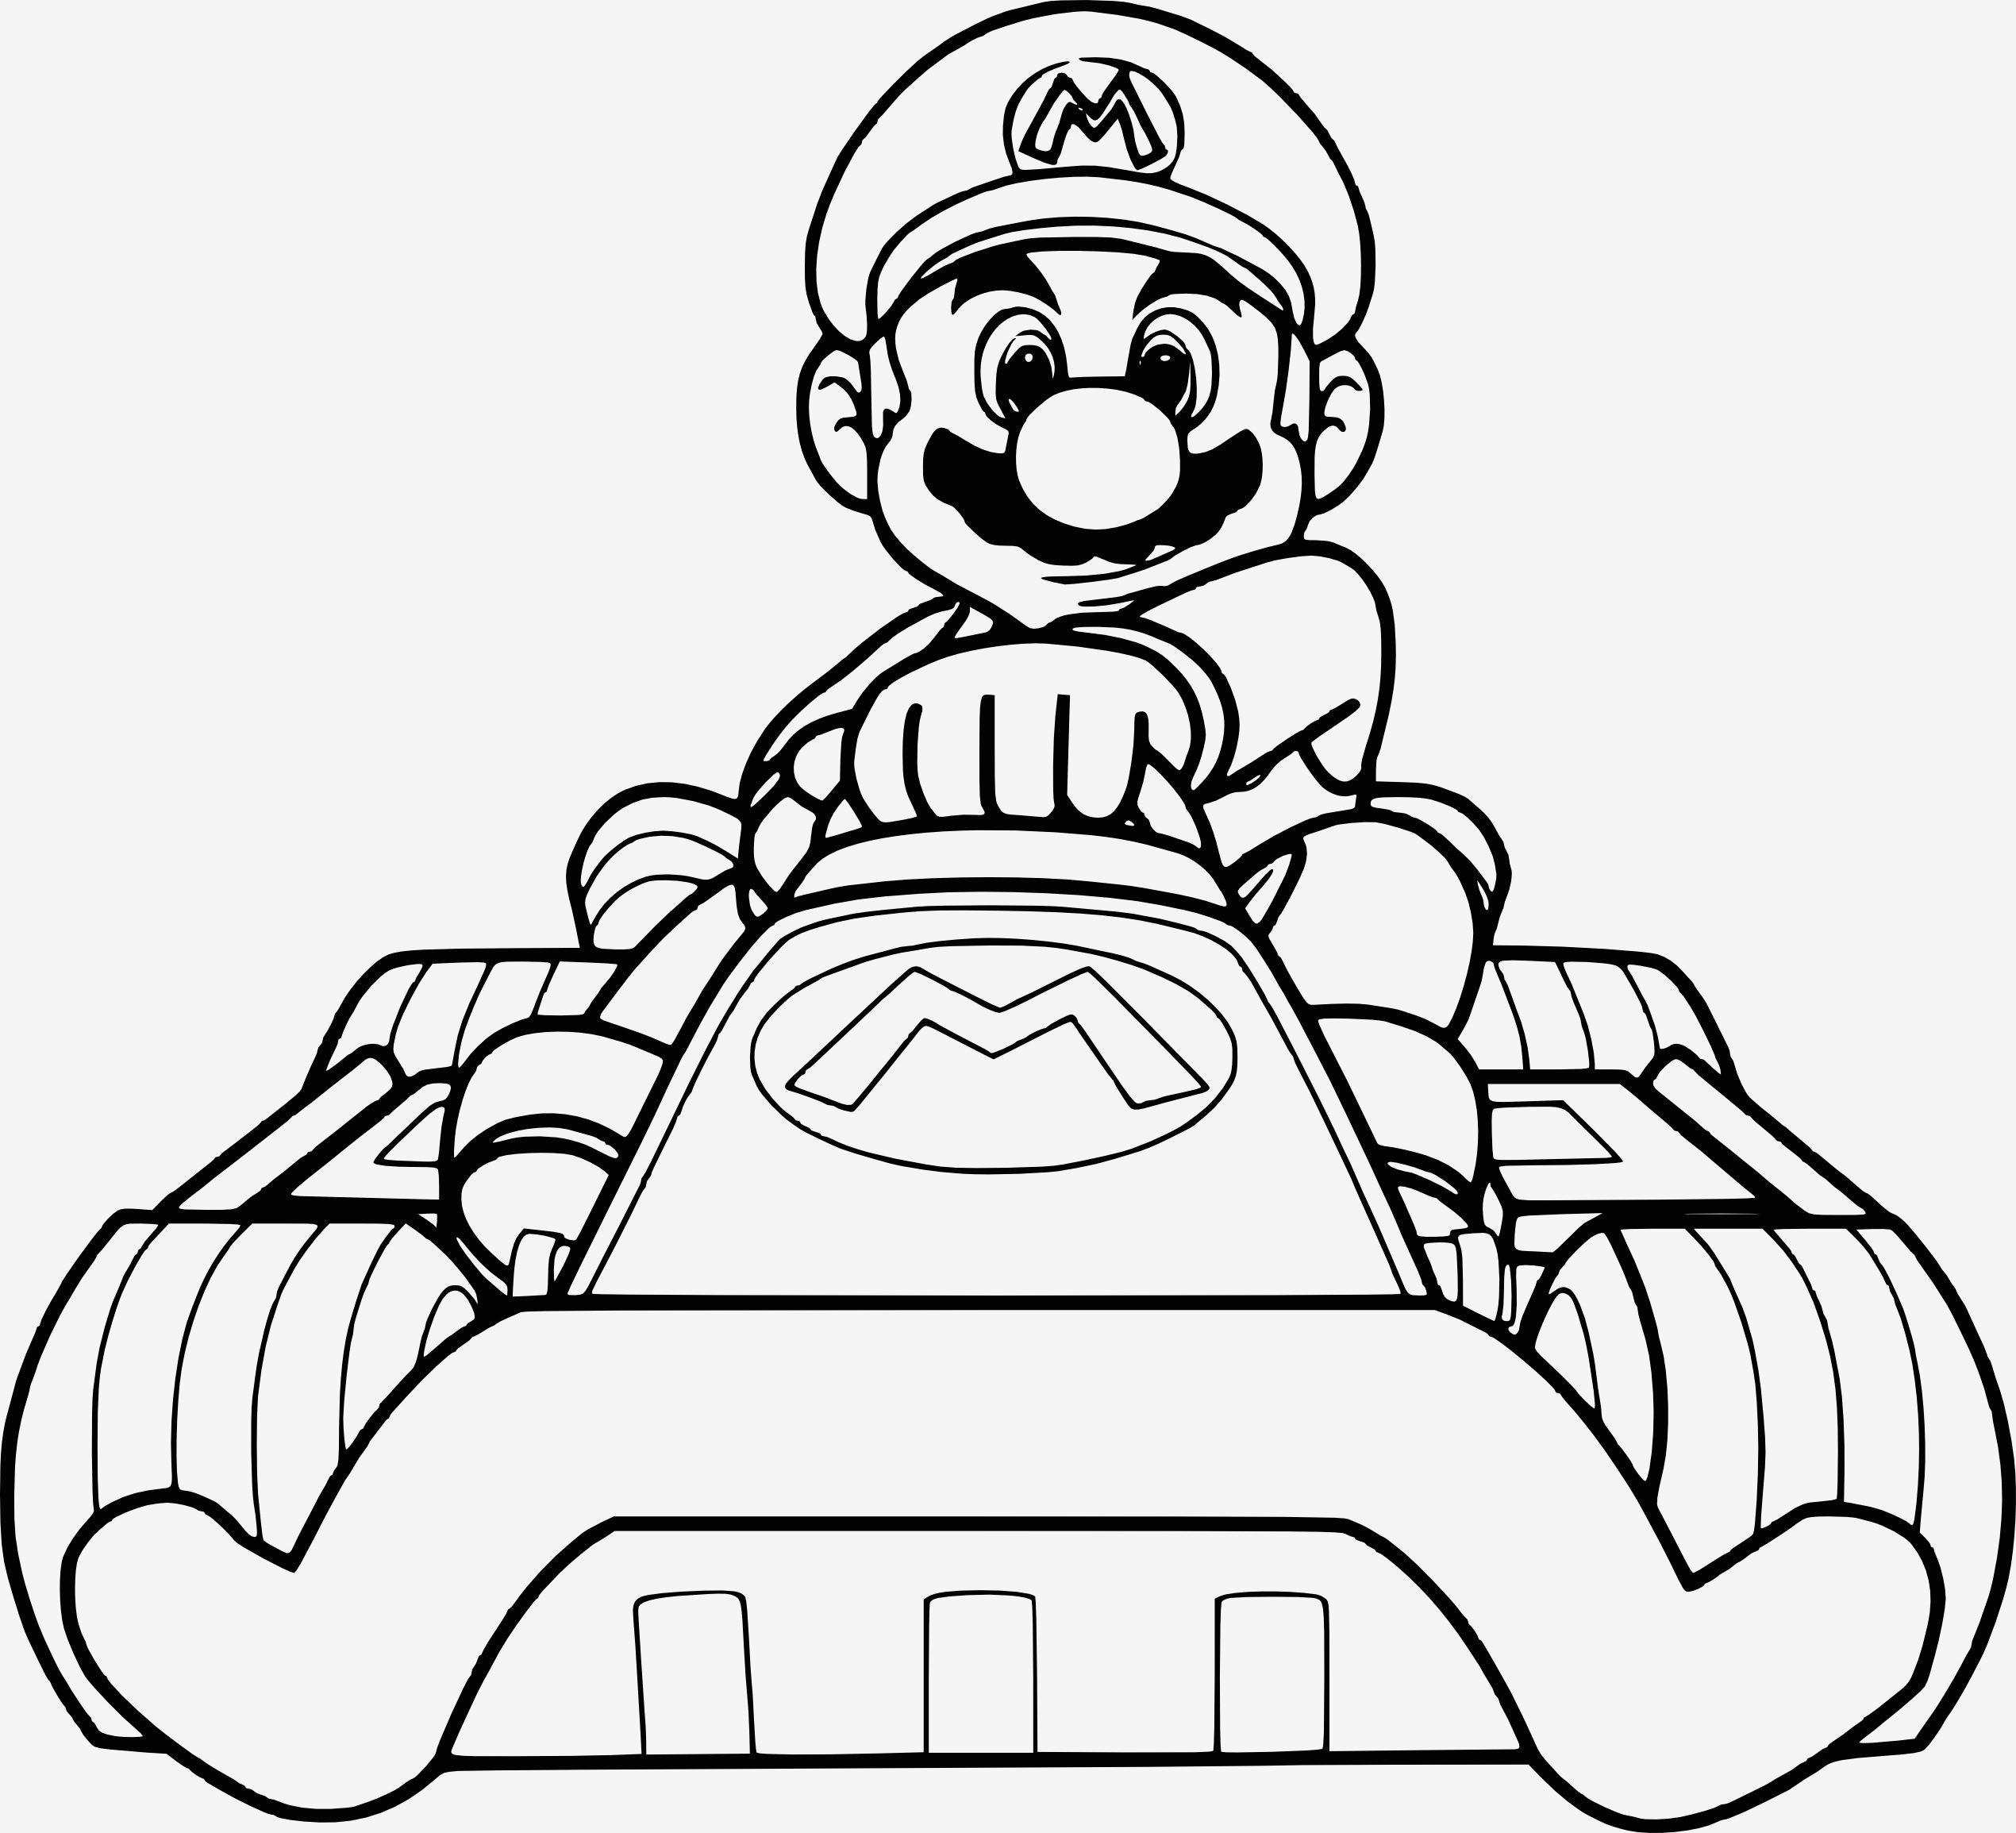 Malvorlage Super Mario Neu Spannende Coloring Bilder Super Mario Malvorlagen Schön Malvorlagen Bild